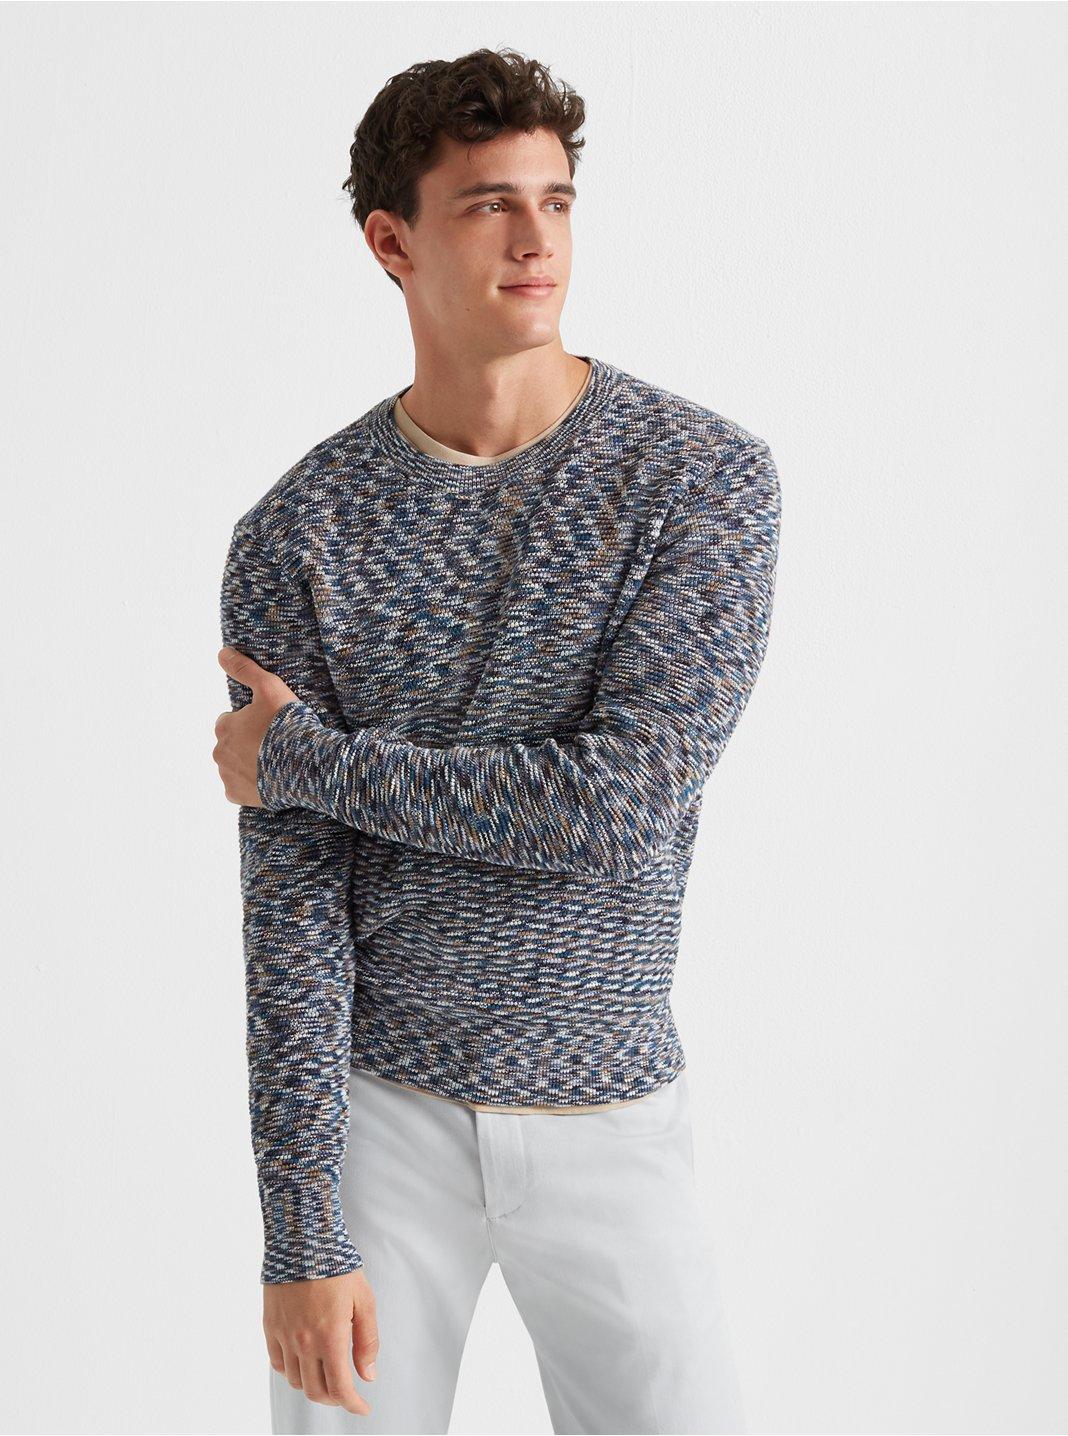 Spacedye Stitch Crew Sweater